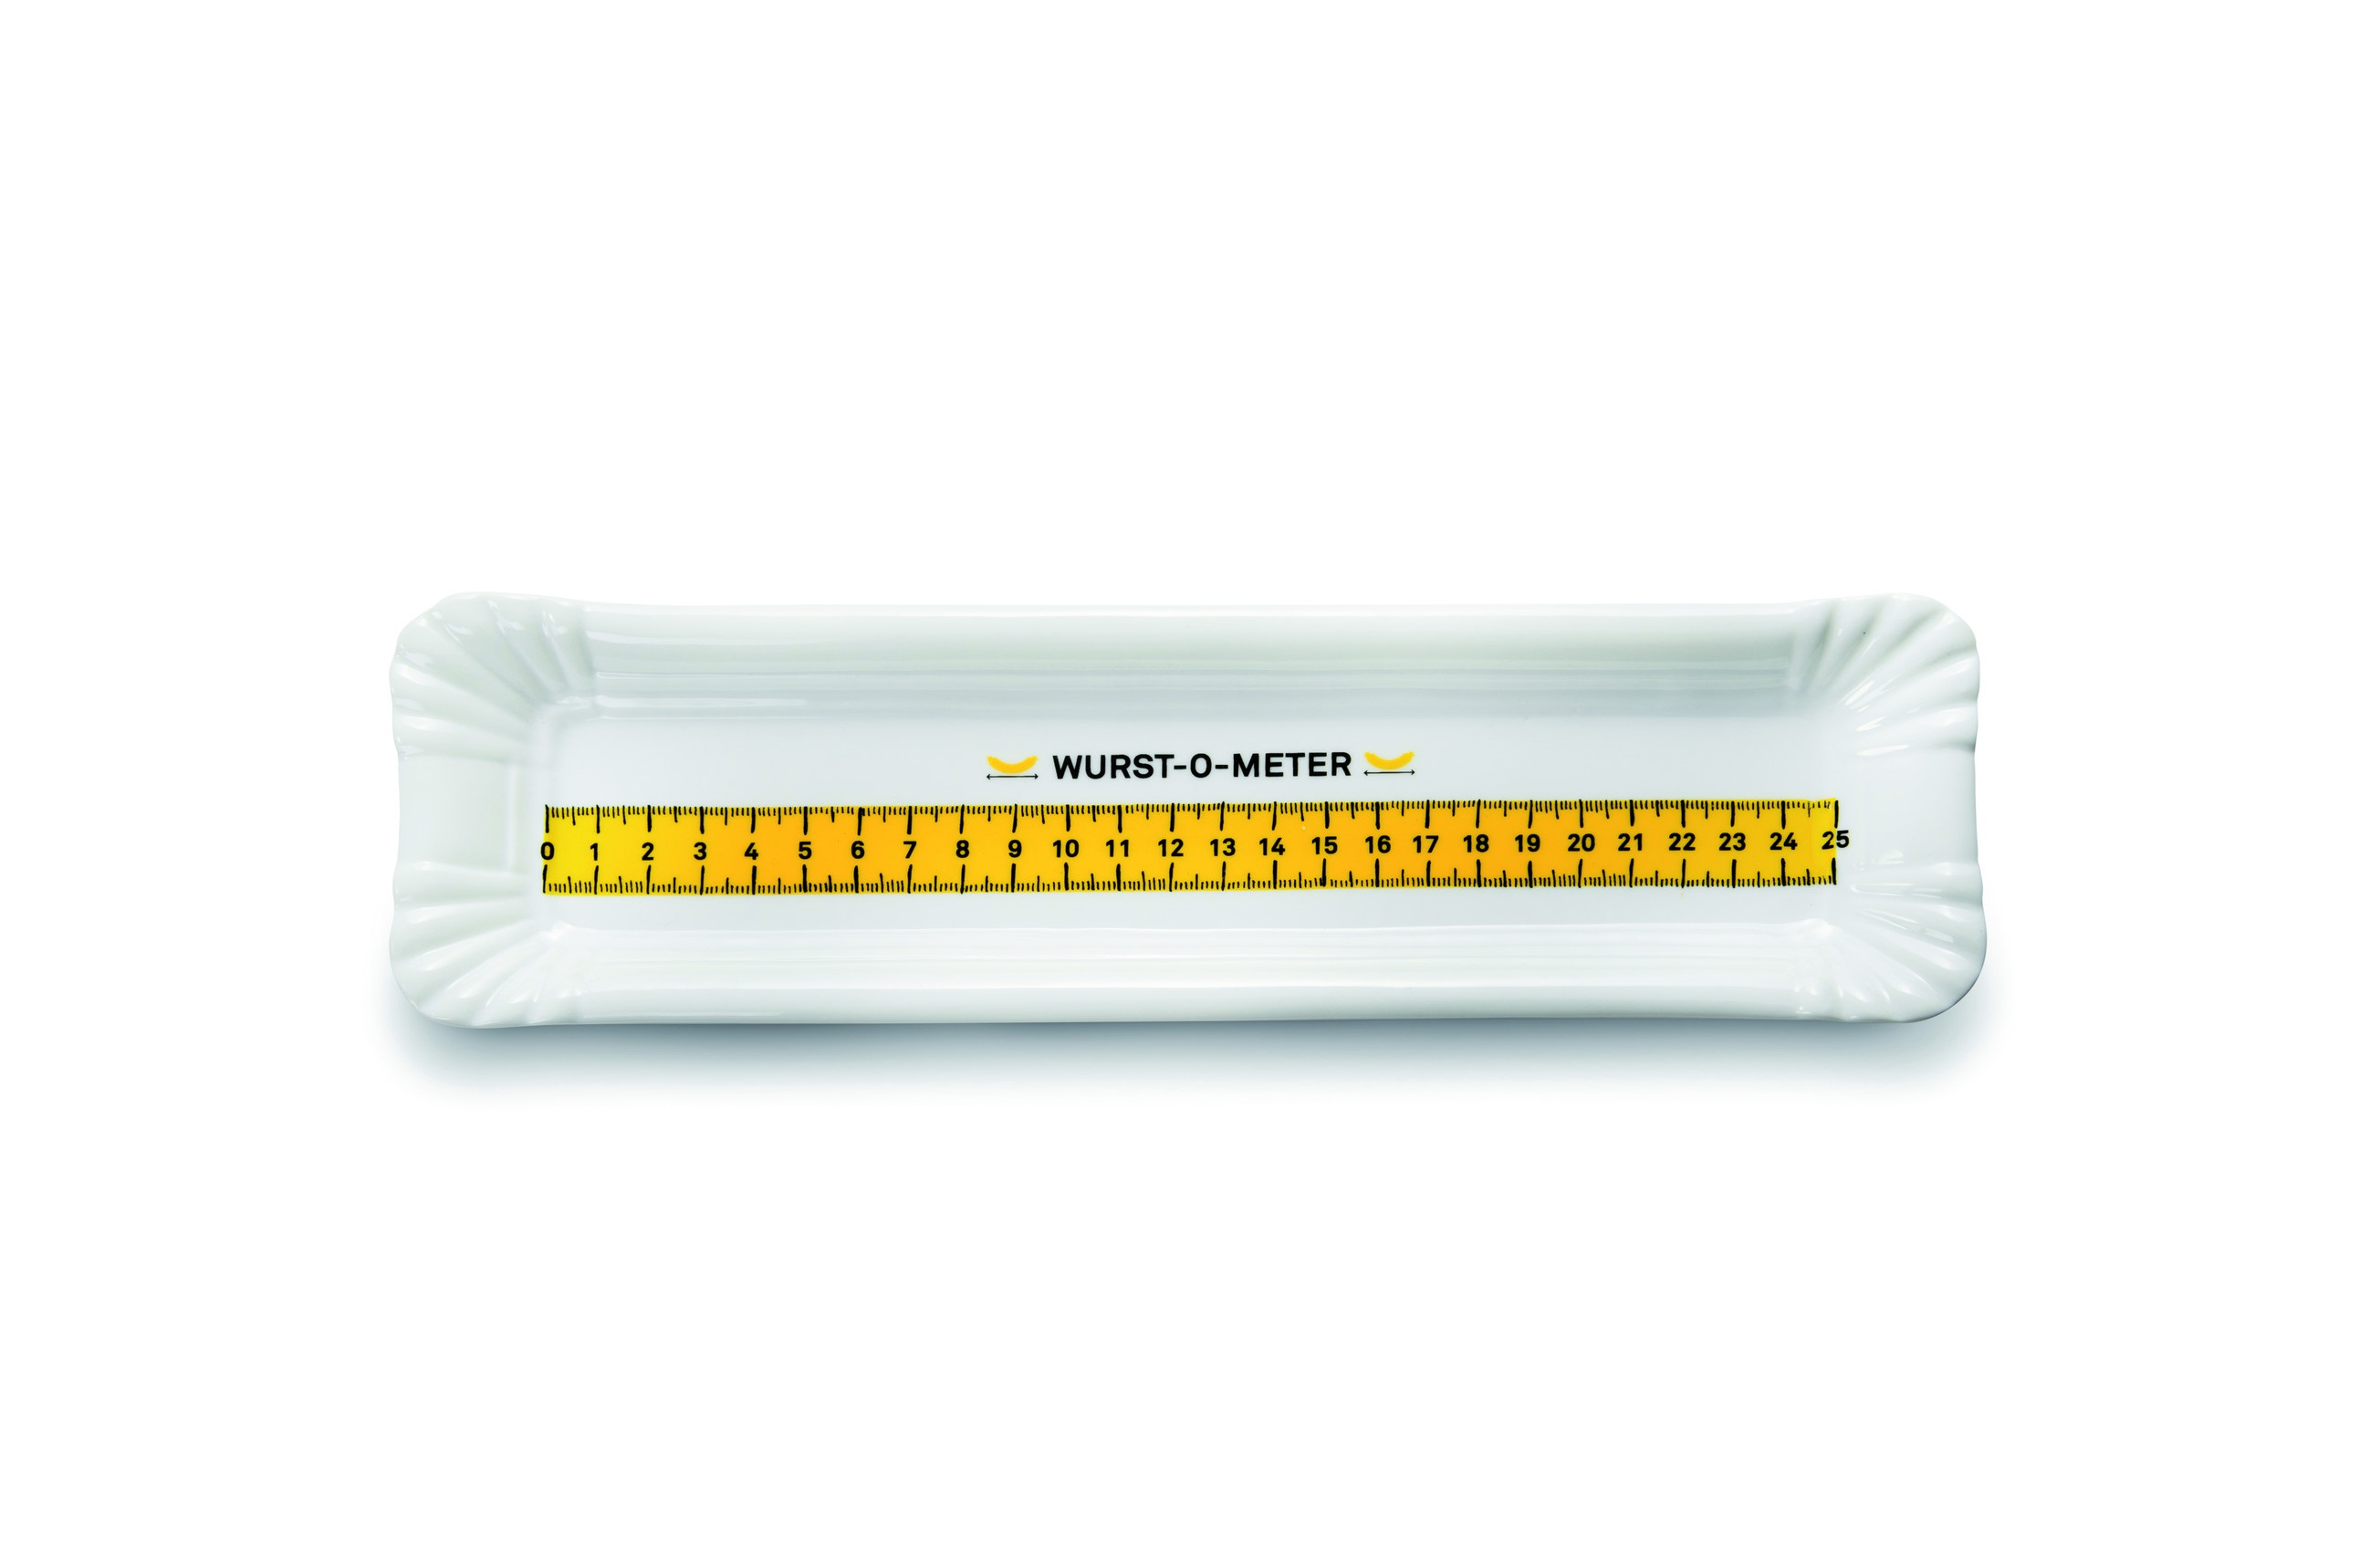 Тарелка Wurst-O-MeterТарелки<br><br><br>Material: Фарфор<br>Ширина см: 30<br>Высота см: 2<br>Глубина см: 8